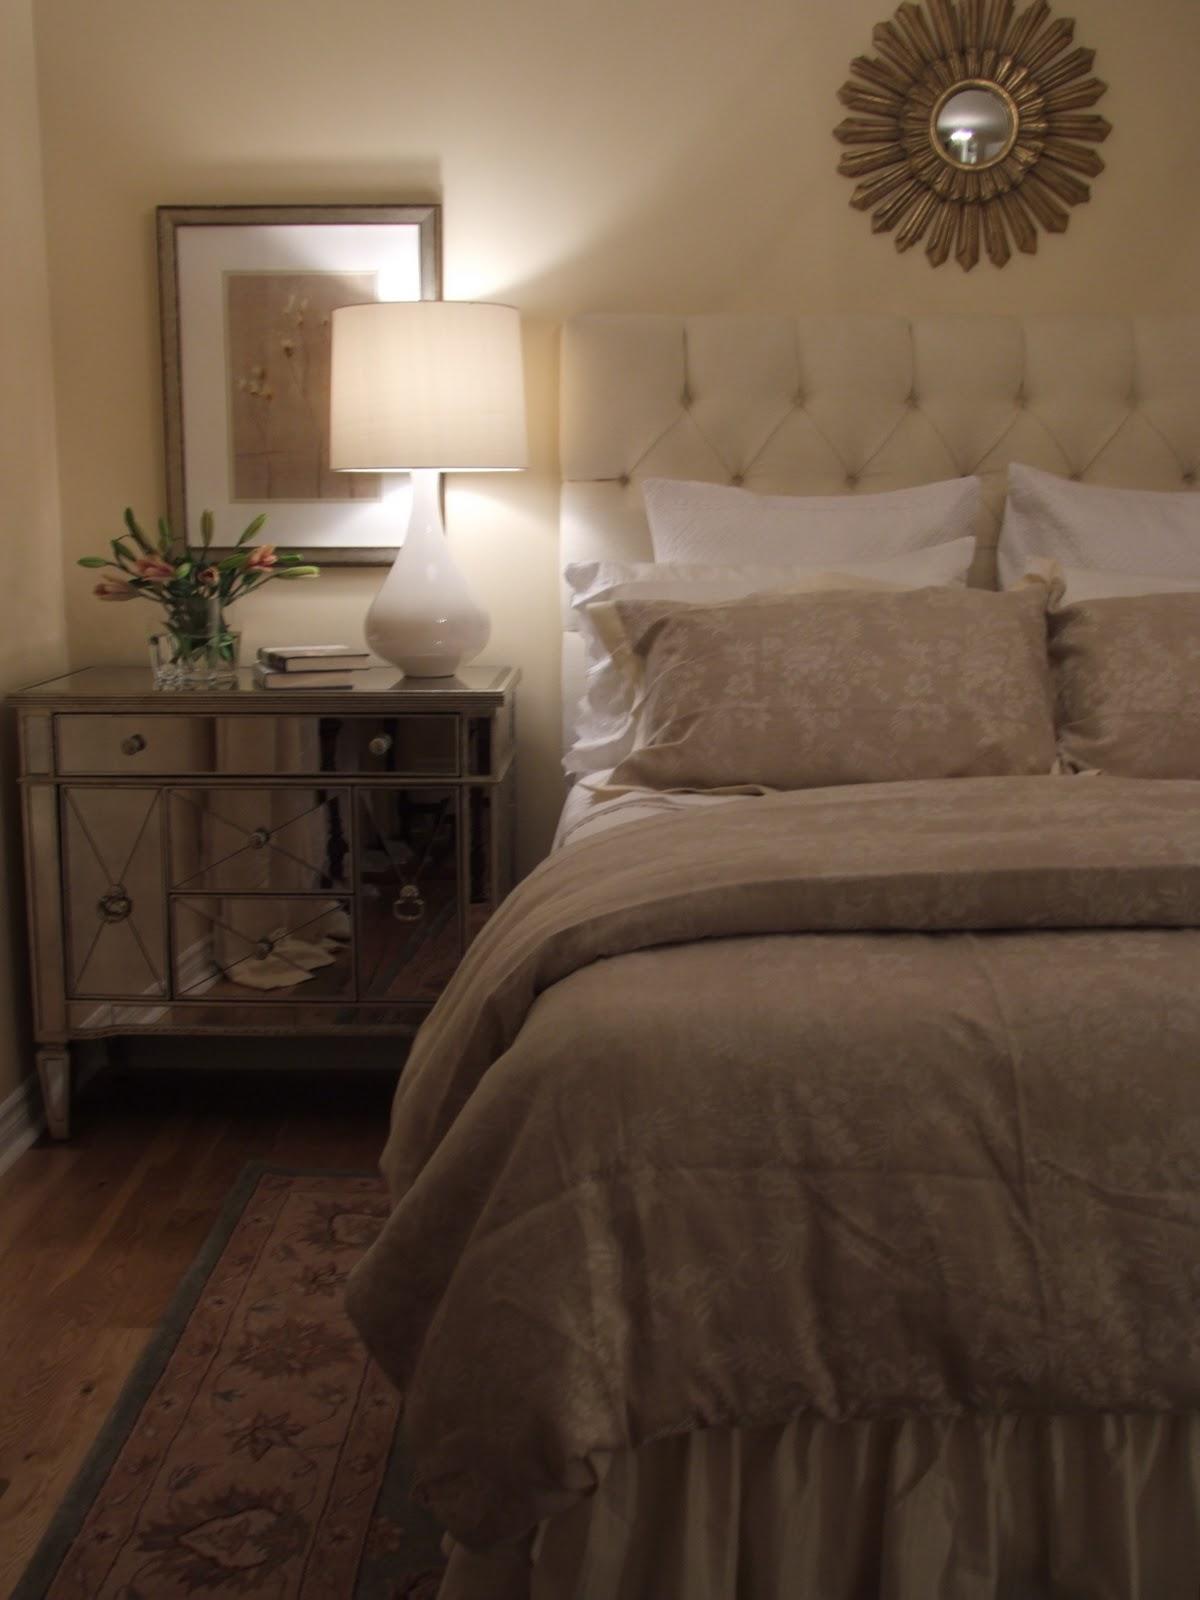 Master Bedroom Decorating Ideas On A Budget: CREED: Master Retreat: 70's Sidesplit